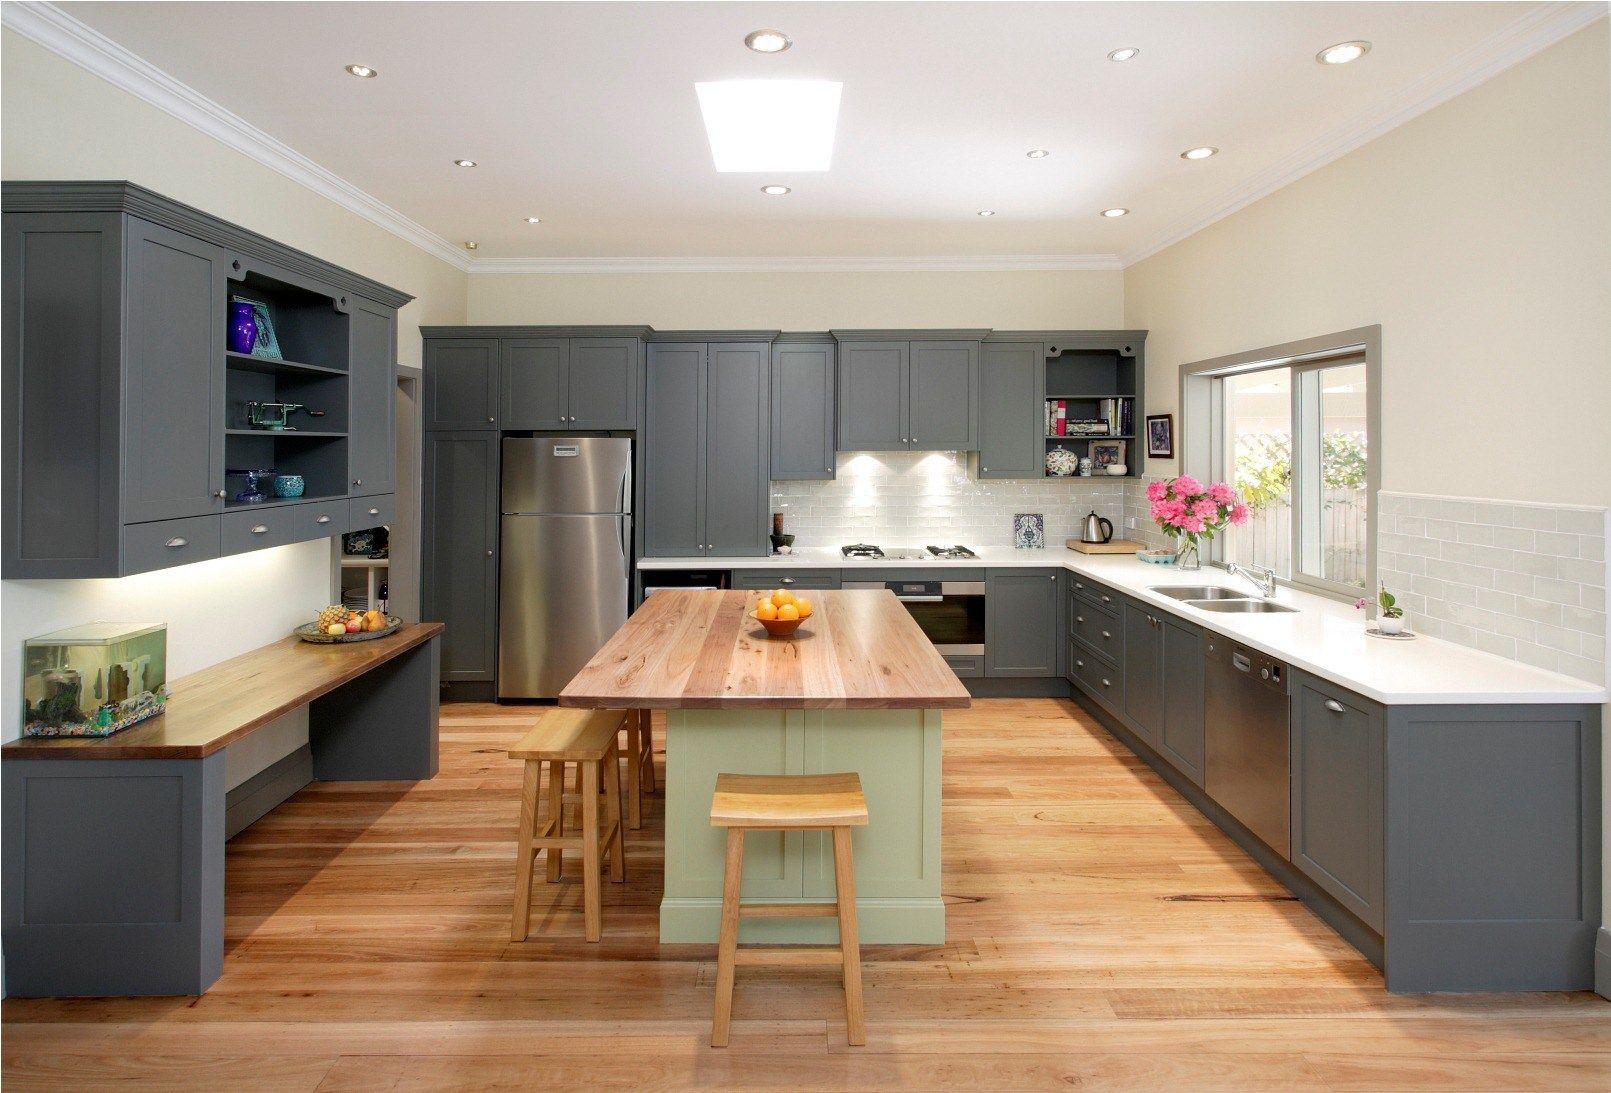 Content Uploads Luxury Modern Kitchen Designs Hd Wallpaper Large Story House Plan Big Kitchen Walk Pantry Screened